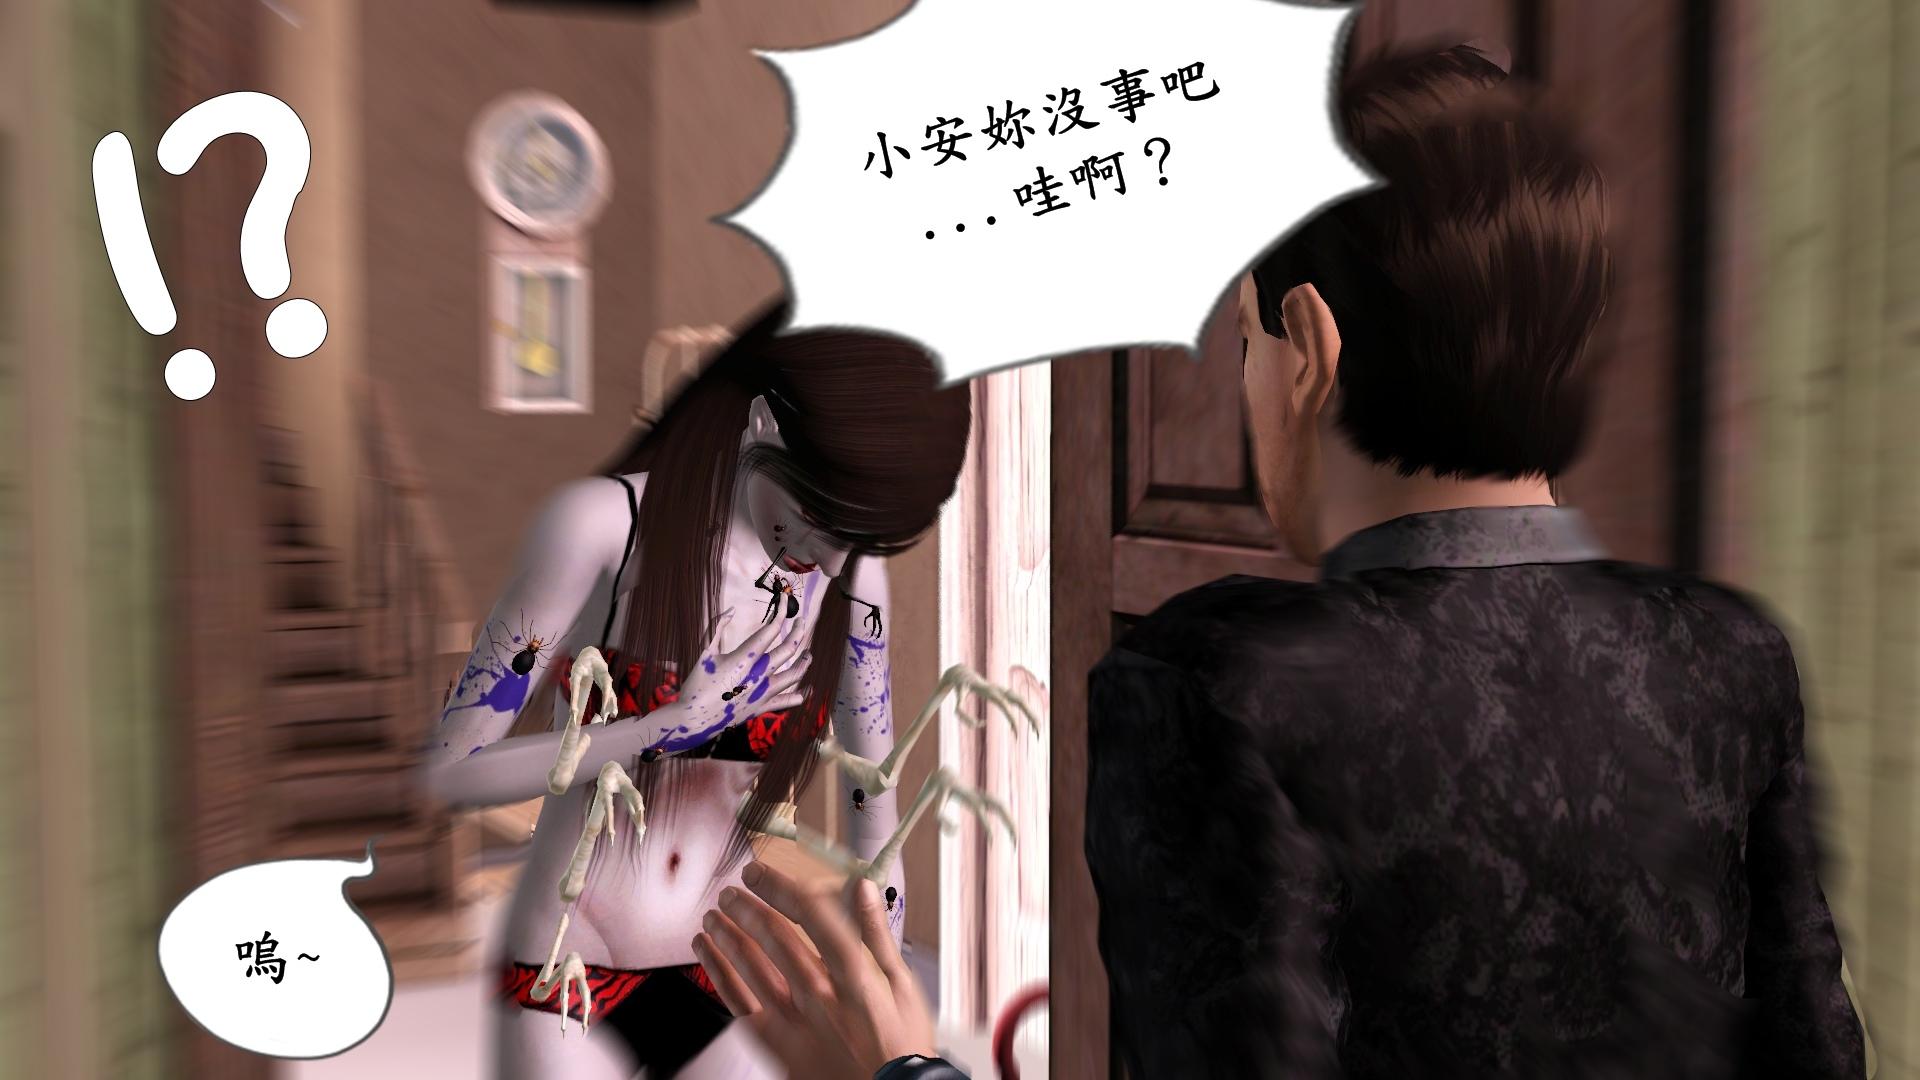 A38小安,妳沒事...哇啊! 咳...(2).jpg